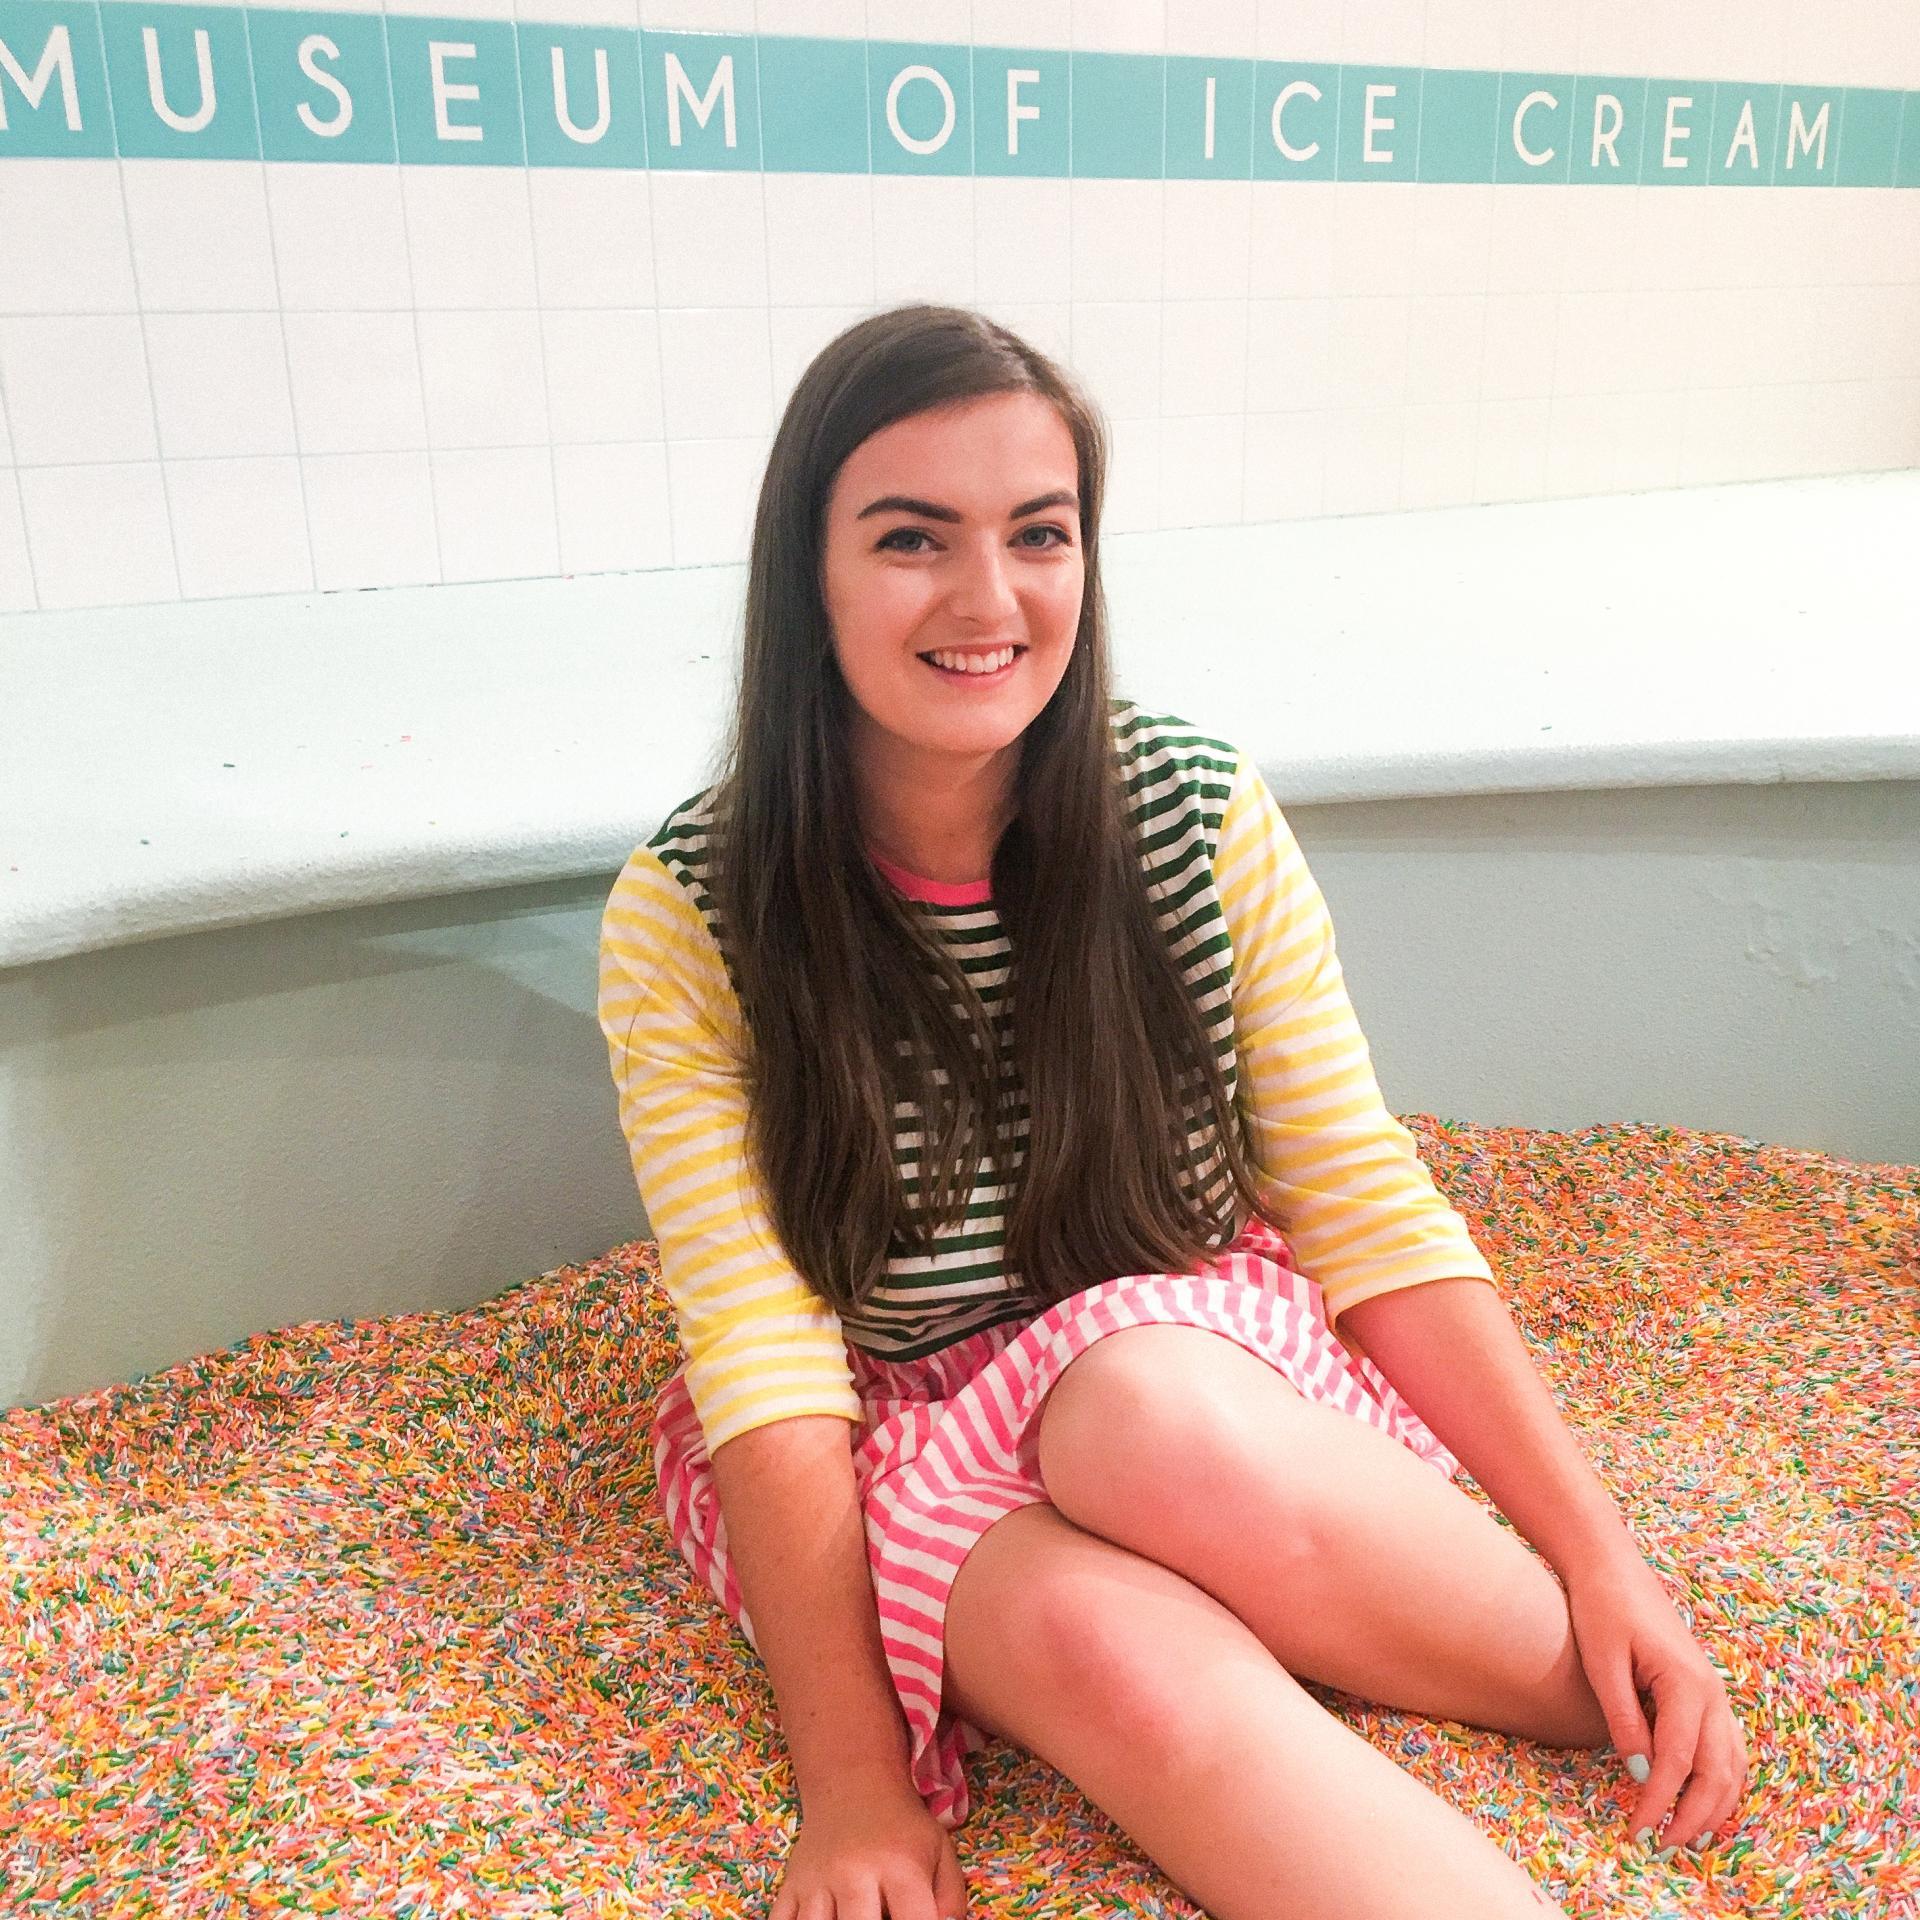 Museum of Ice Cream, San Francisco - Rachel Nicole UK Travel Blogger